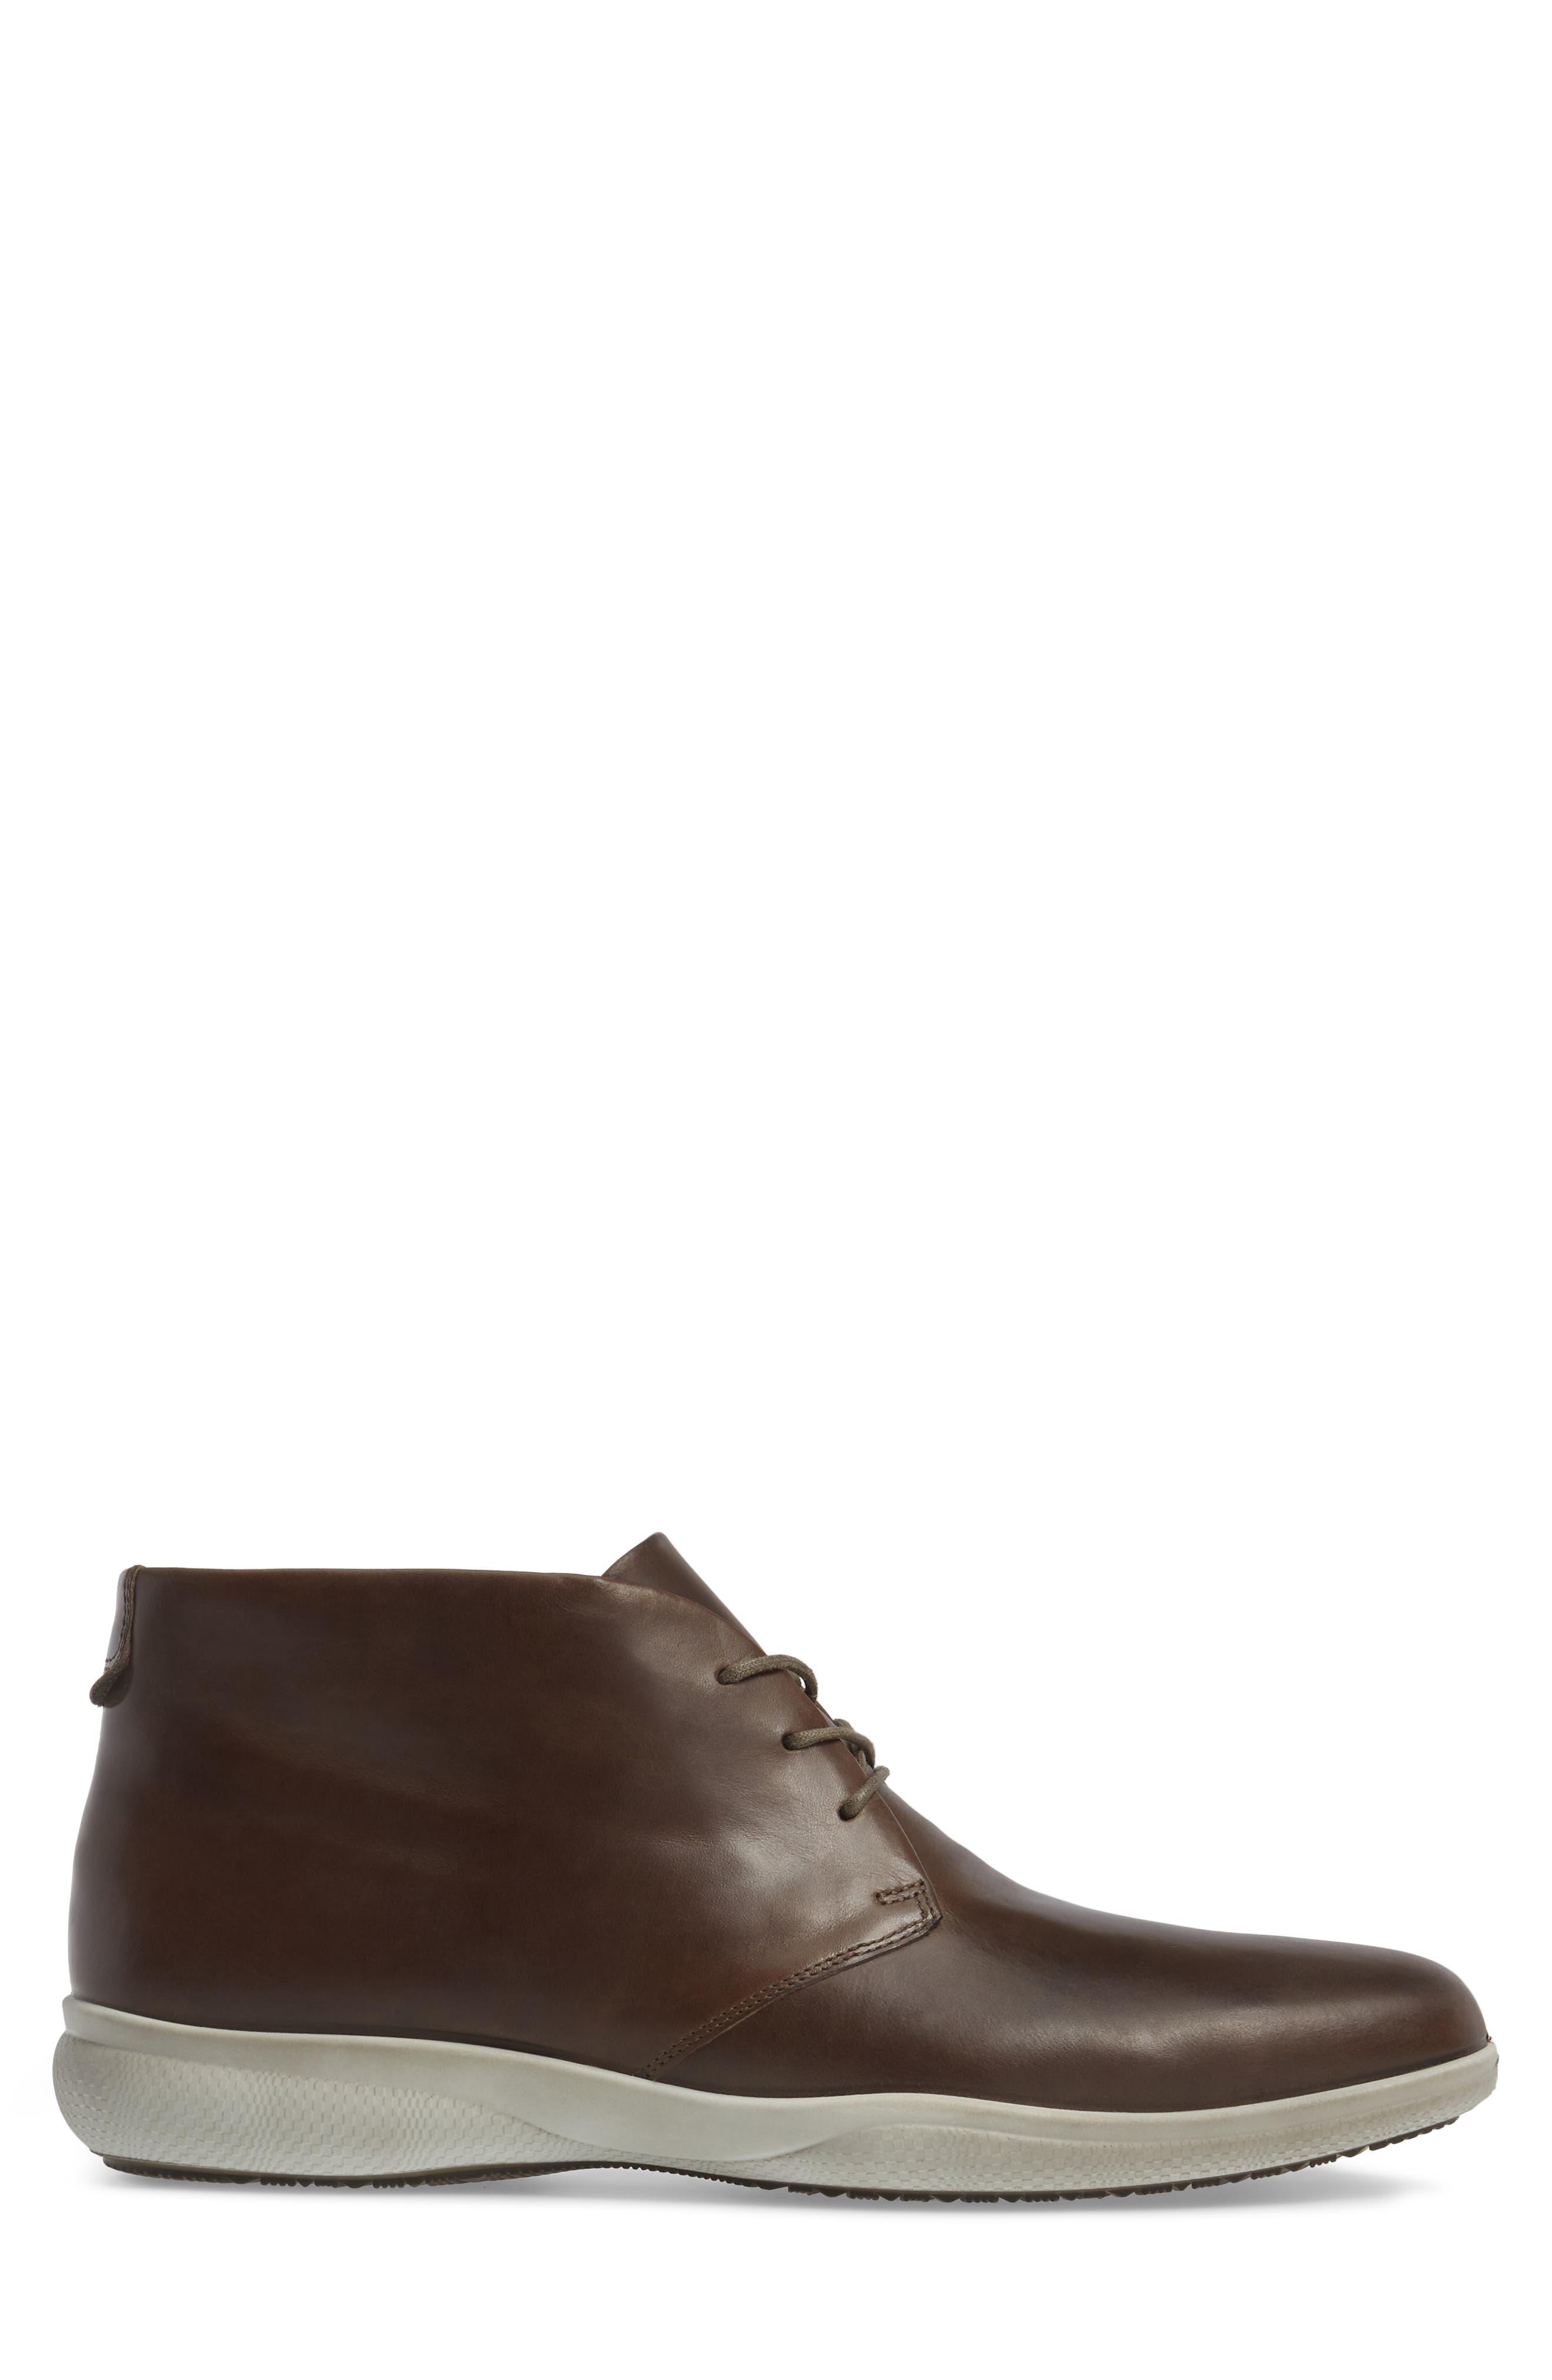 Alternate Image 3  - ECCO 'Grenoble' Chukka Boot (Men)